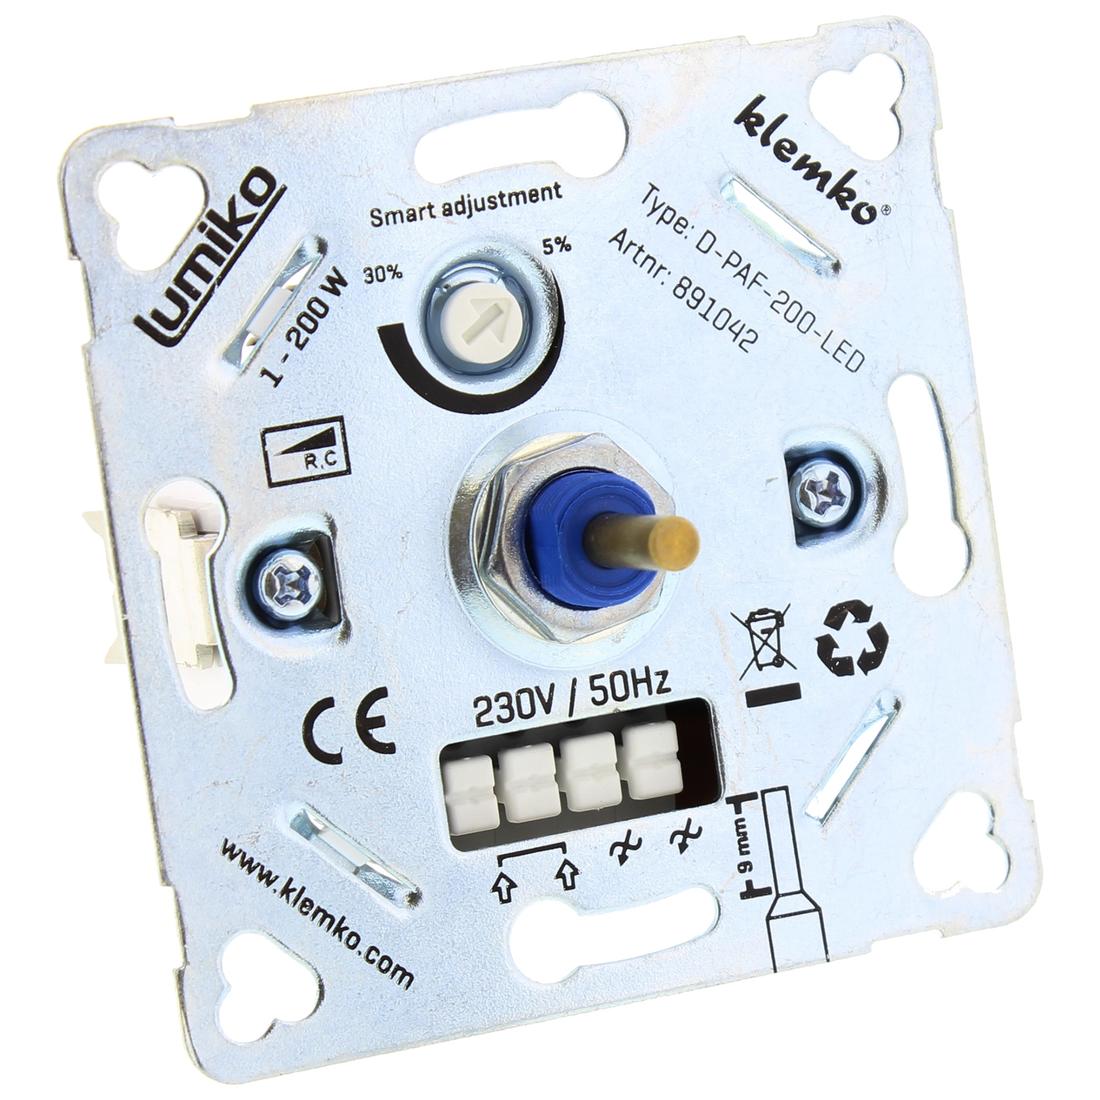 Lumiko Universele leddimmer van 1-200W (D-PAF-200-LED)